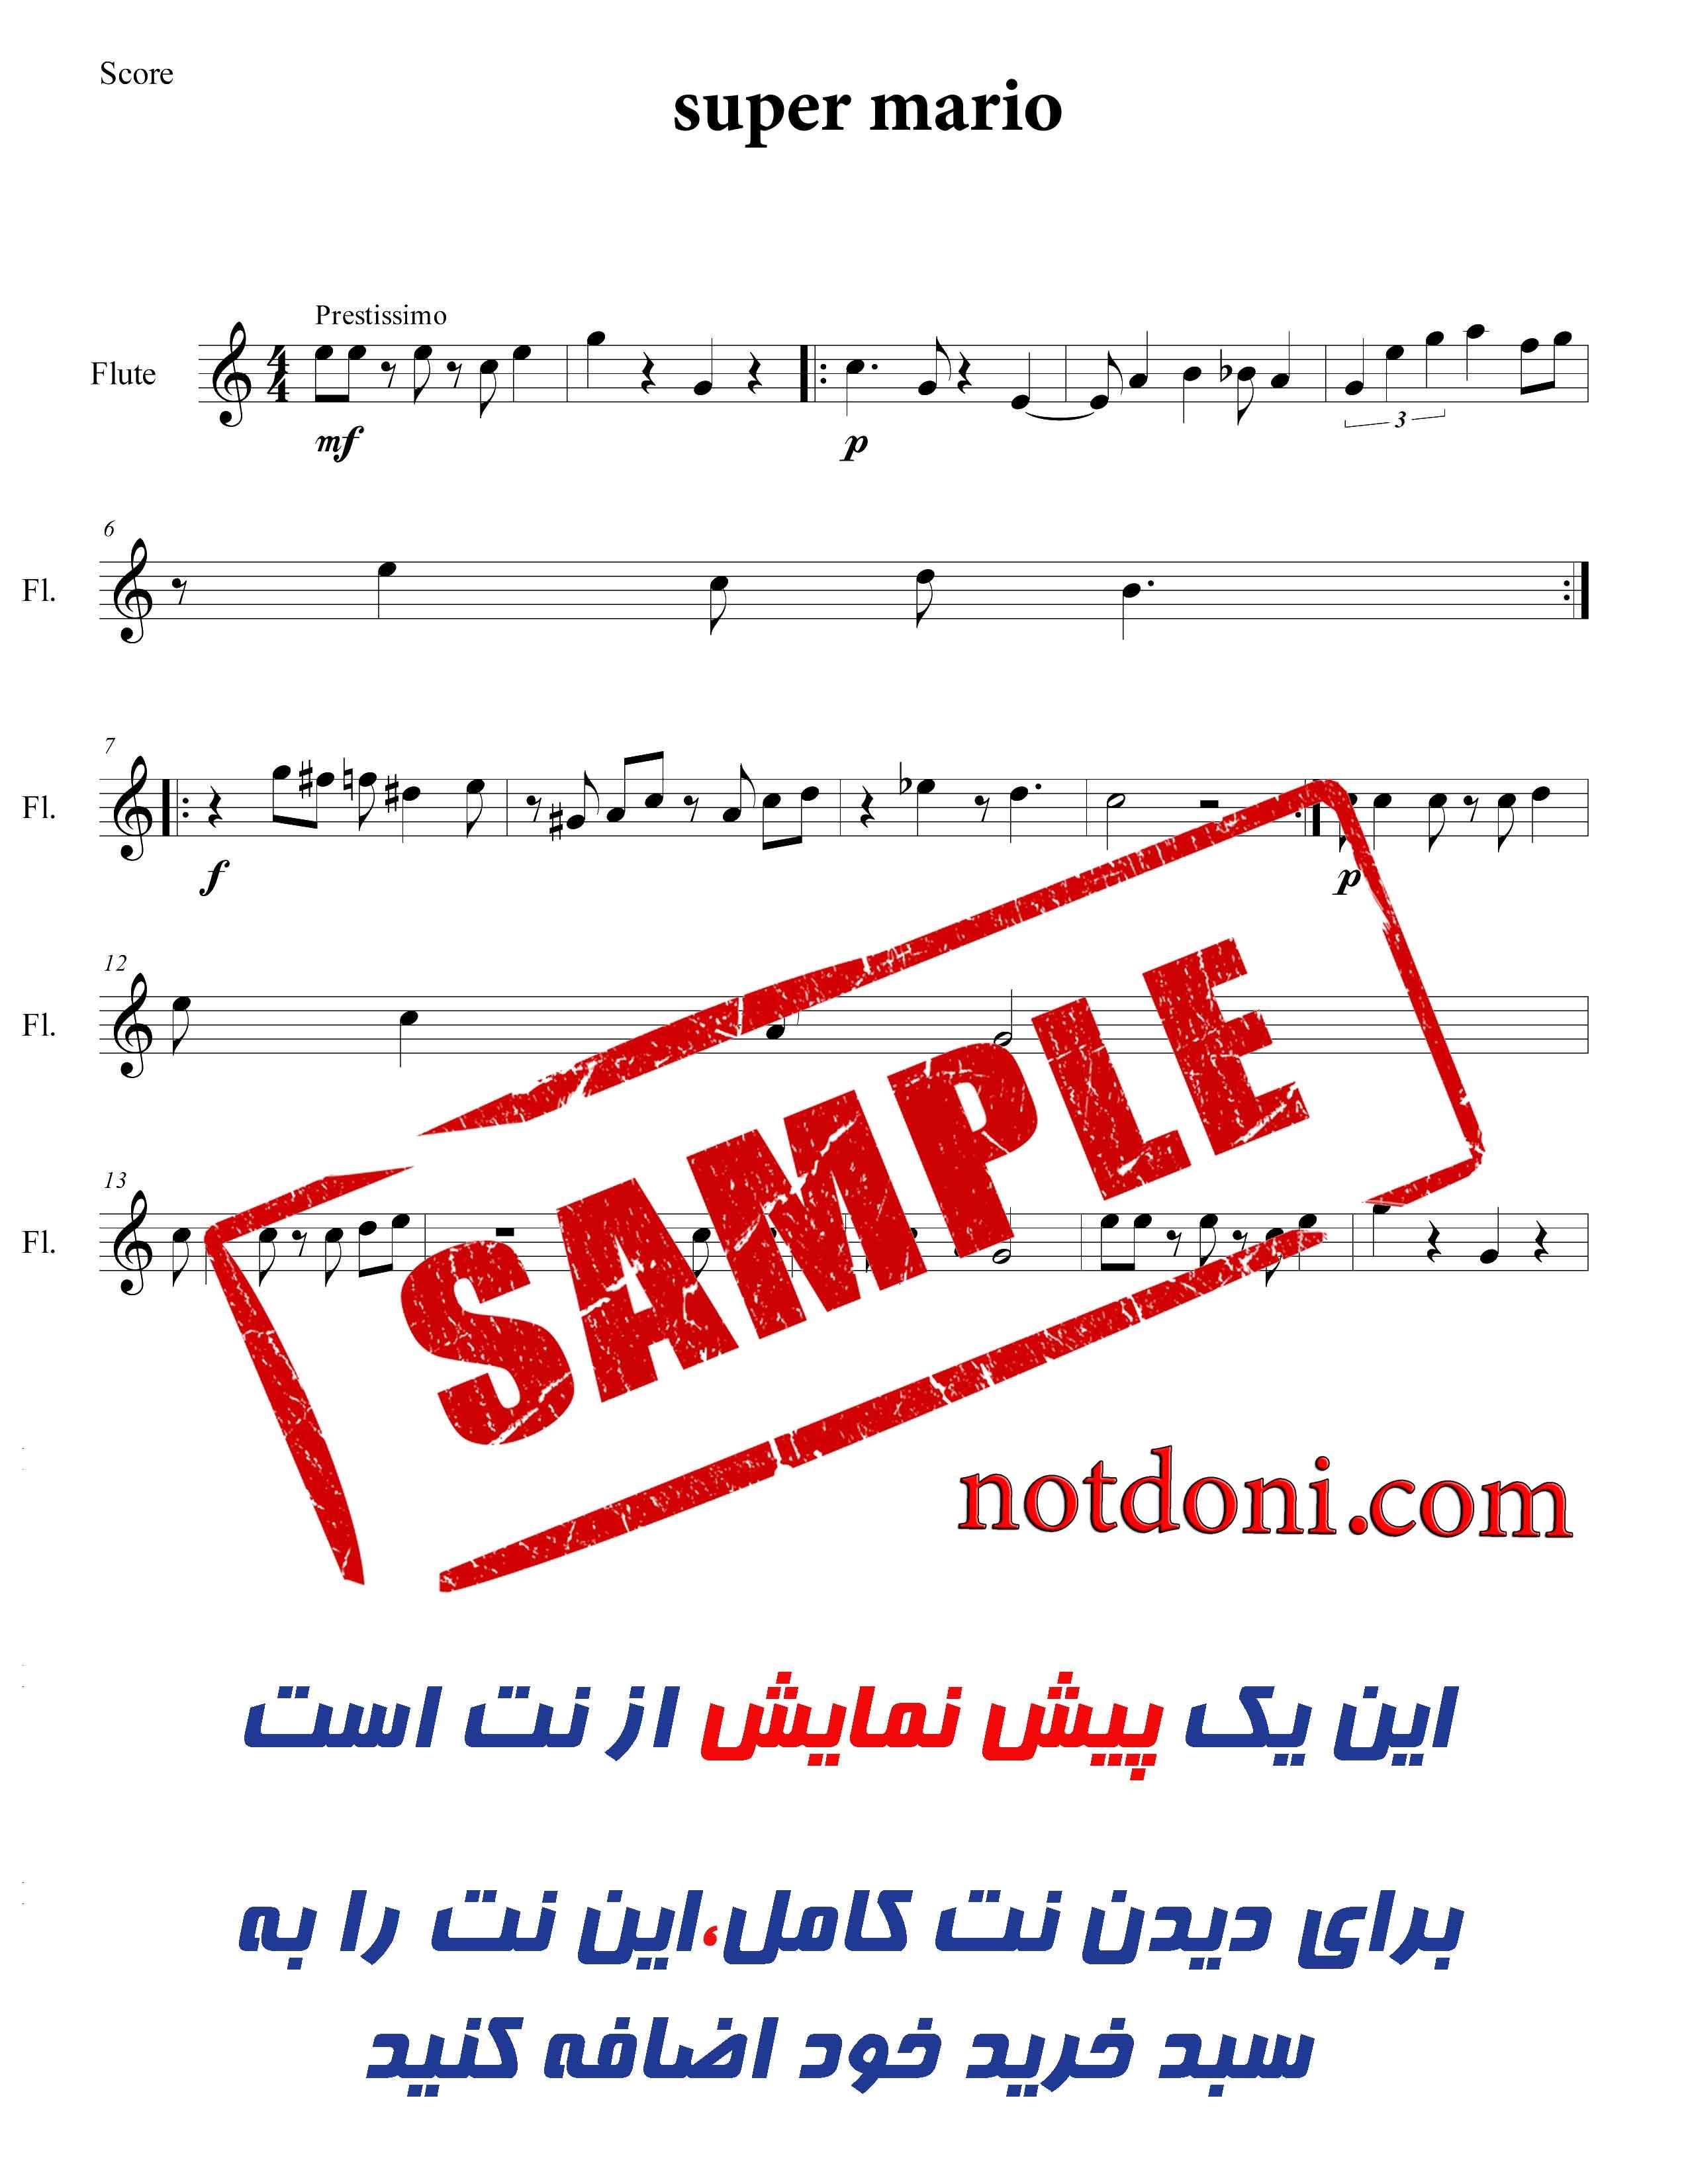 1992dcb3-9b18-4a53-a0e6-a436534b667d_نت-آهنگ.jpg